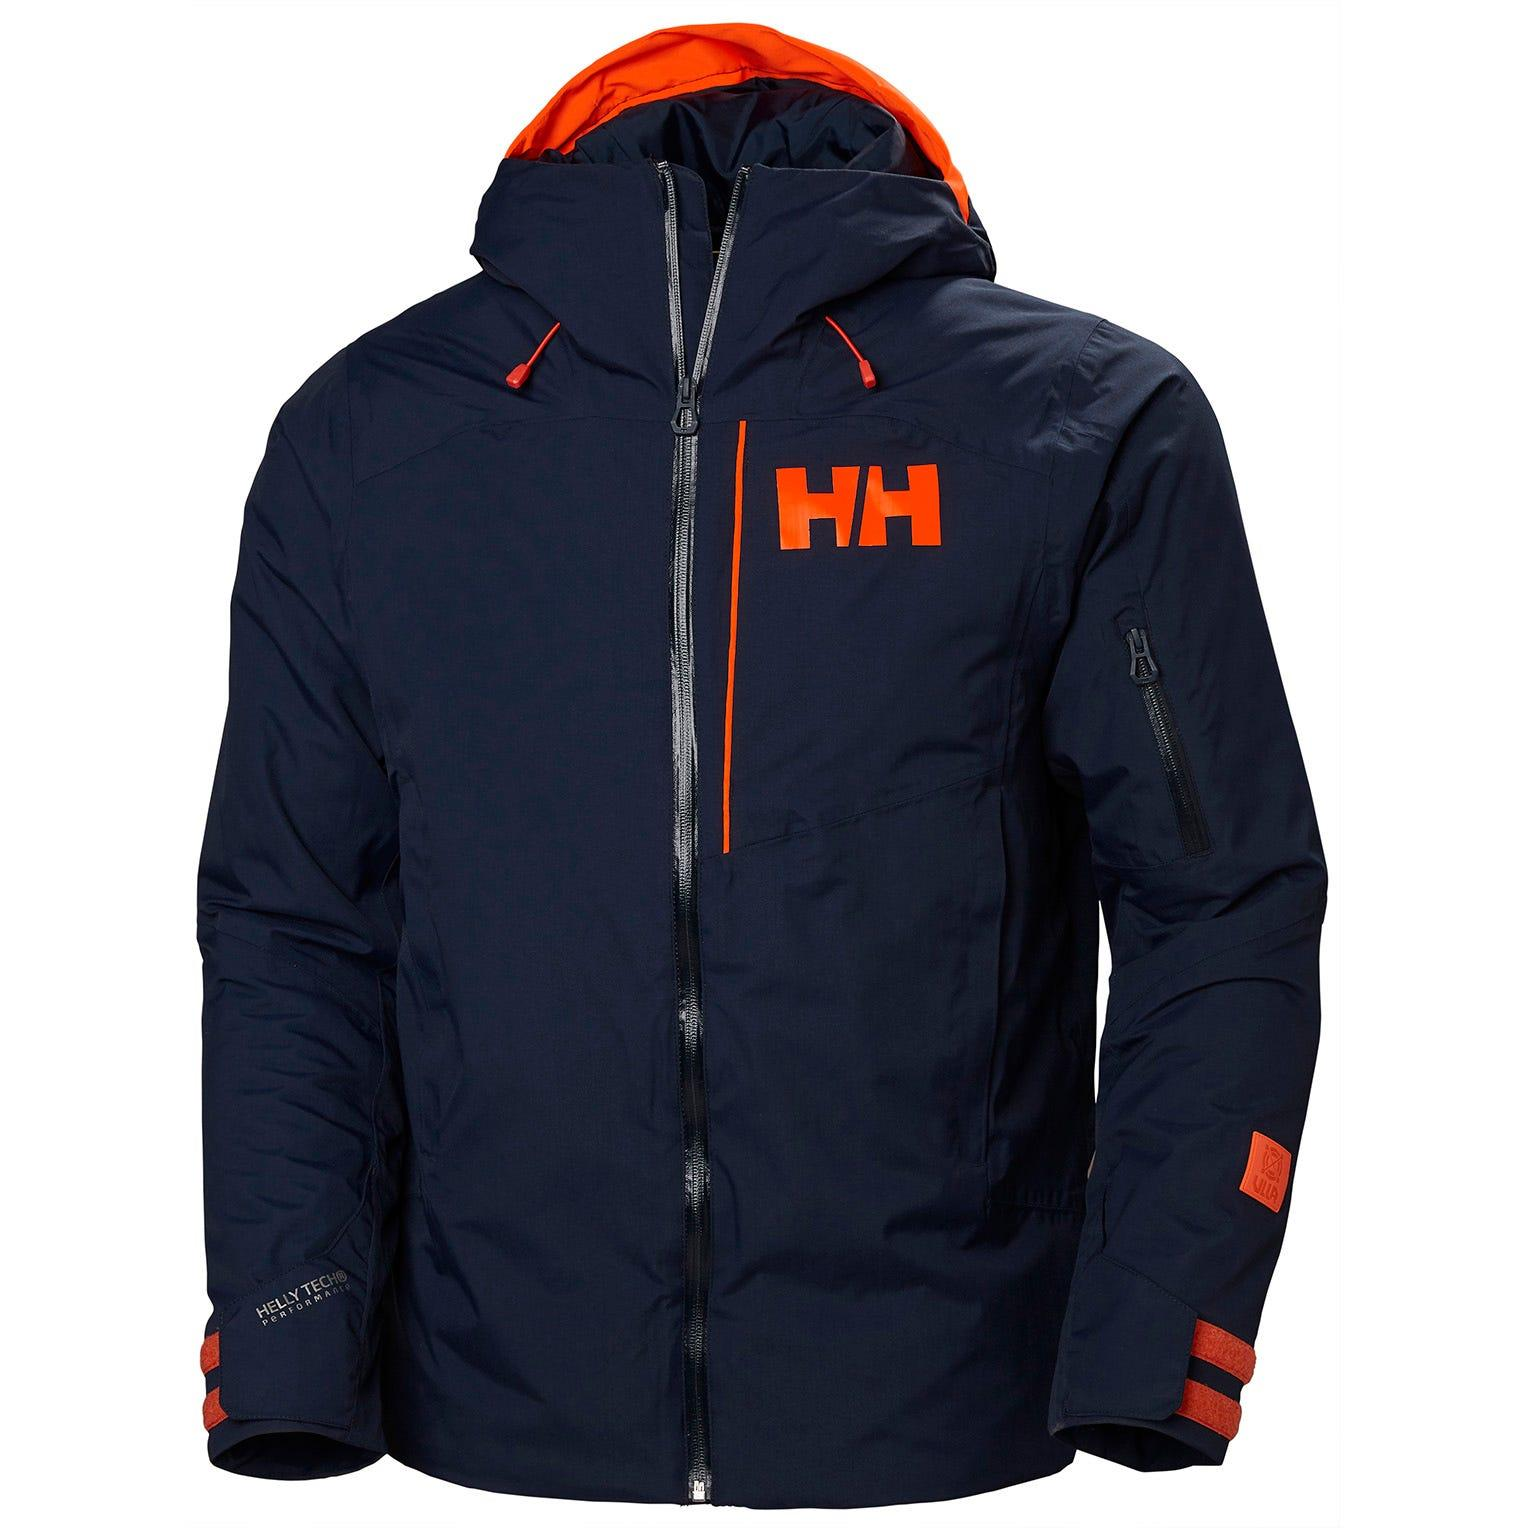 Helly Hansen Powjumper Jacket Navy In Navy Blue Blue For